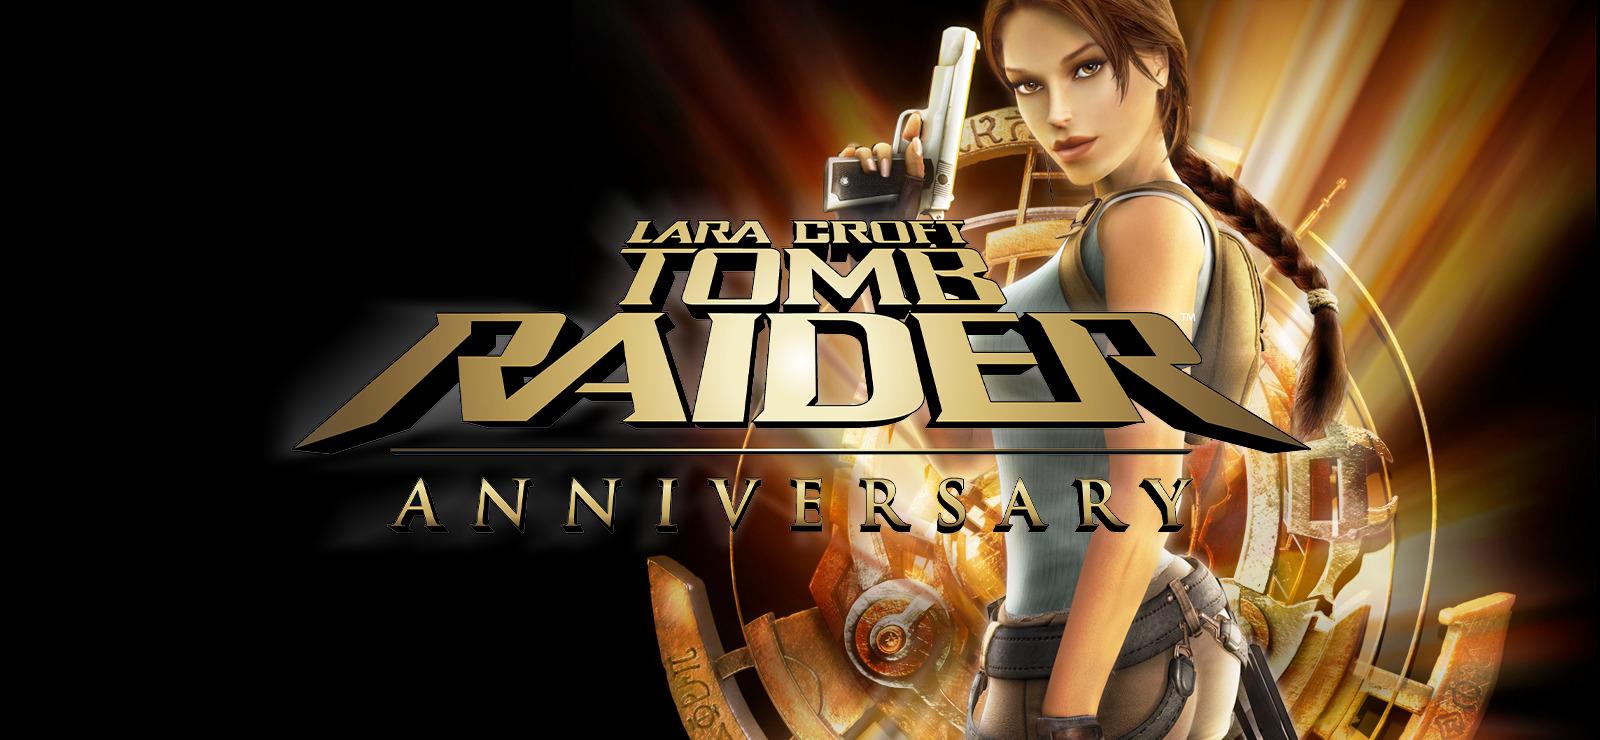 Tomb Raider: Anniversary on GOG.com